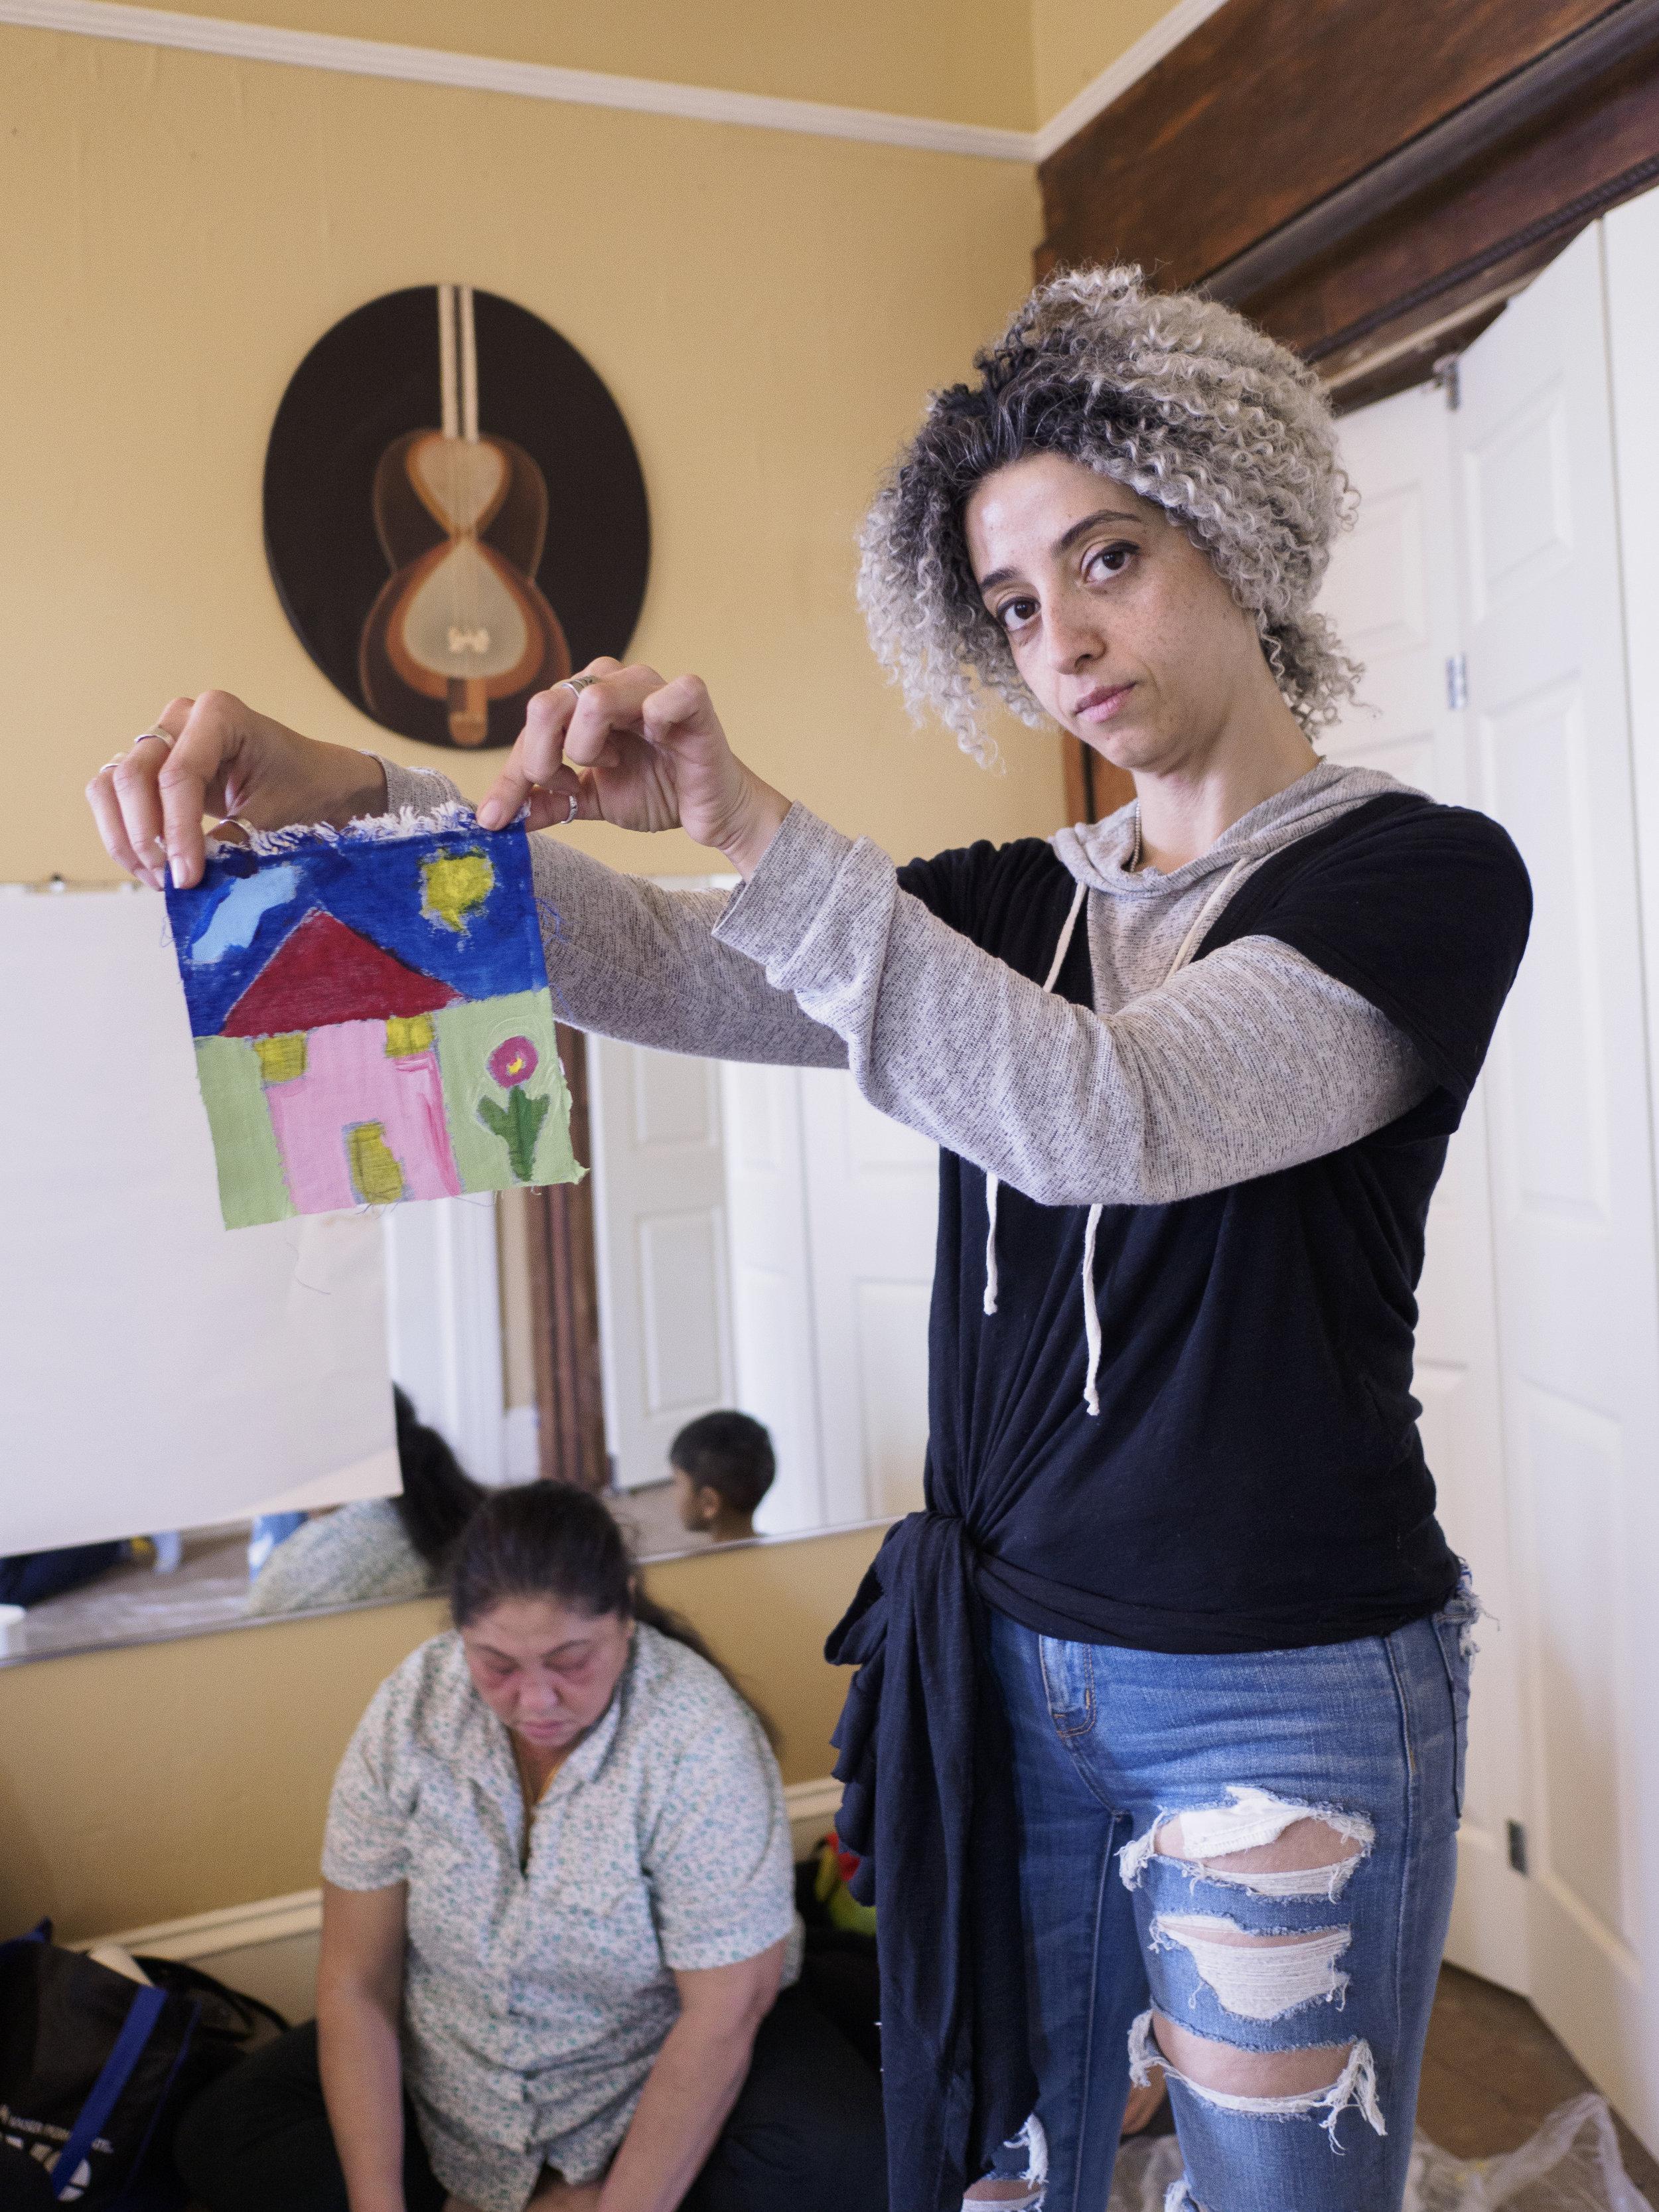 fabric-painting-artogether-women-2.jpg